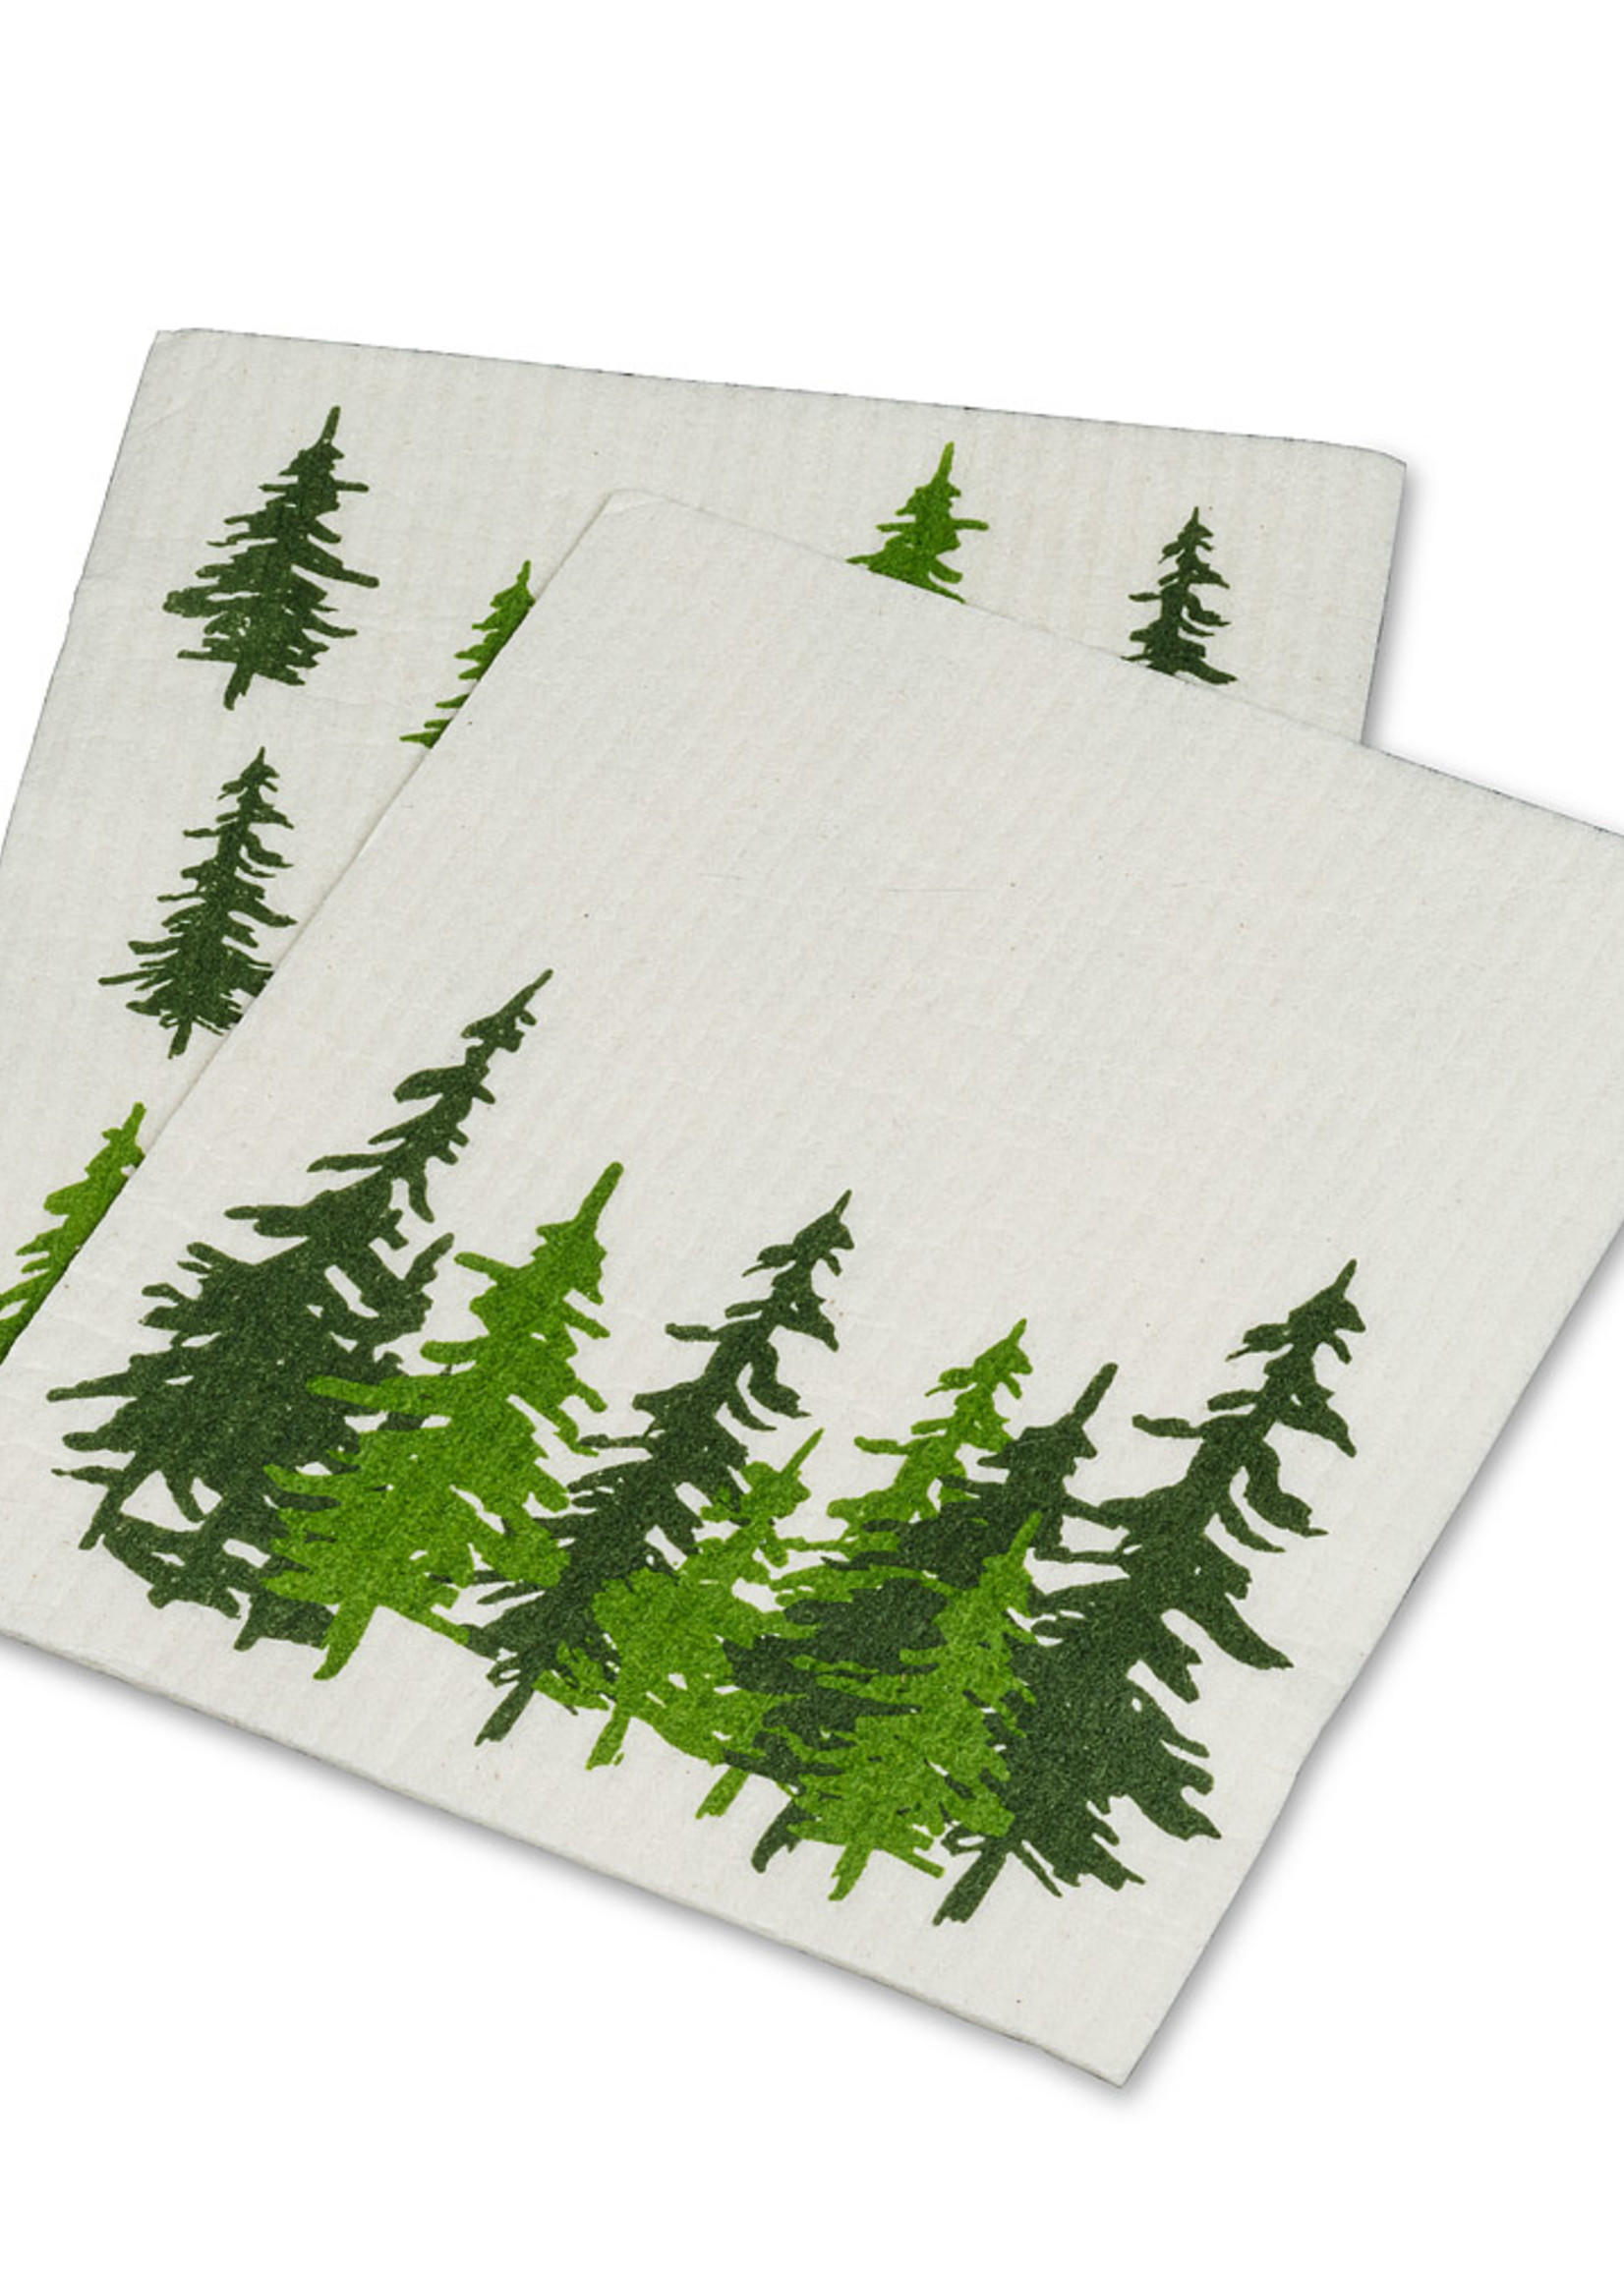 Abbott S/2 Swedish Dishcloth (Pine)